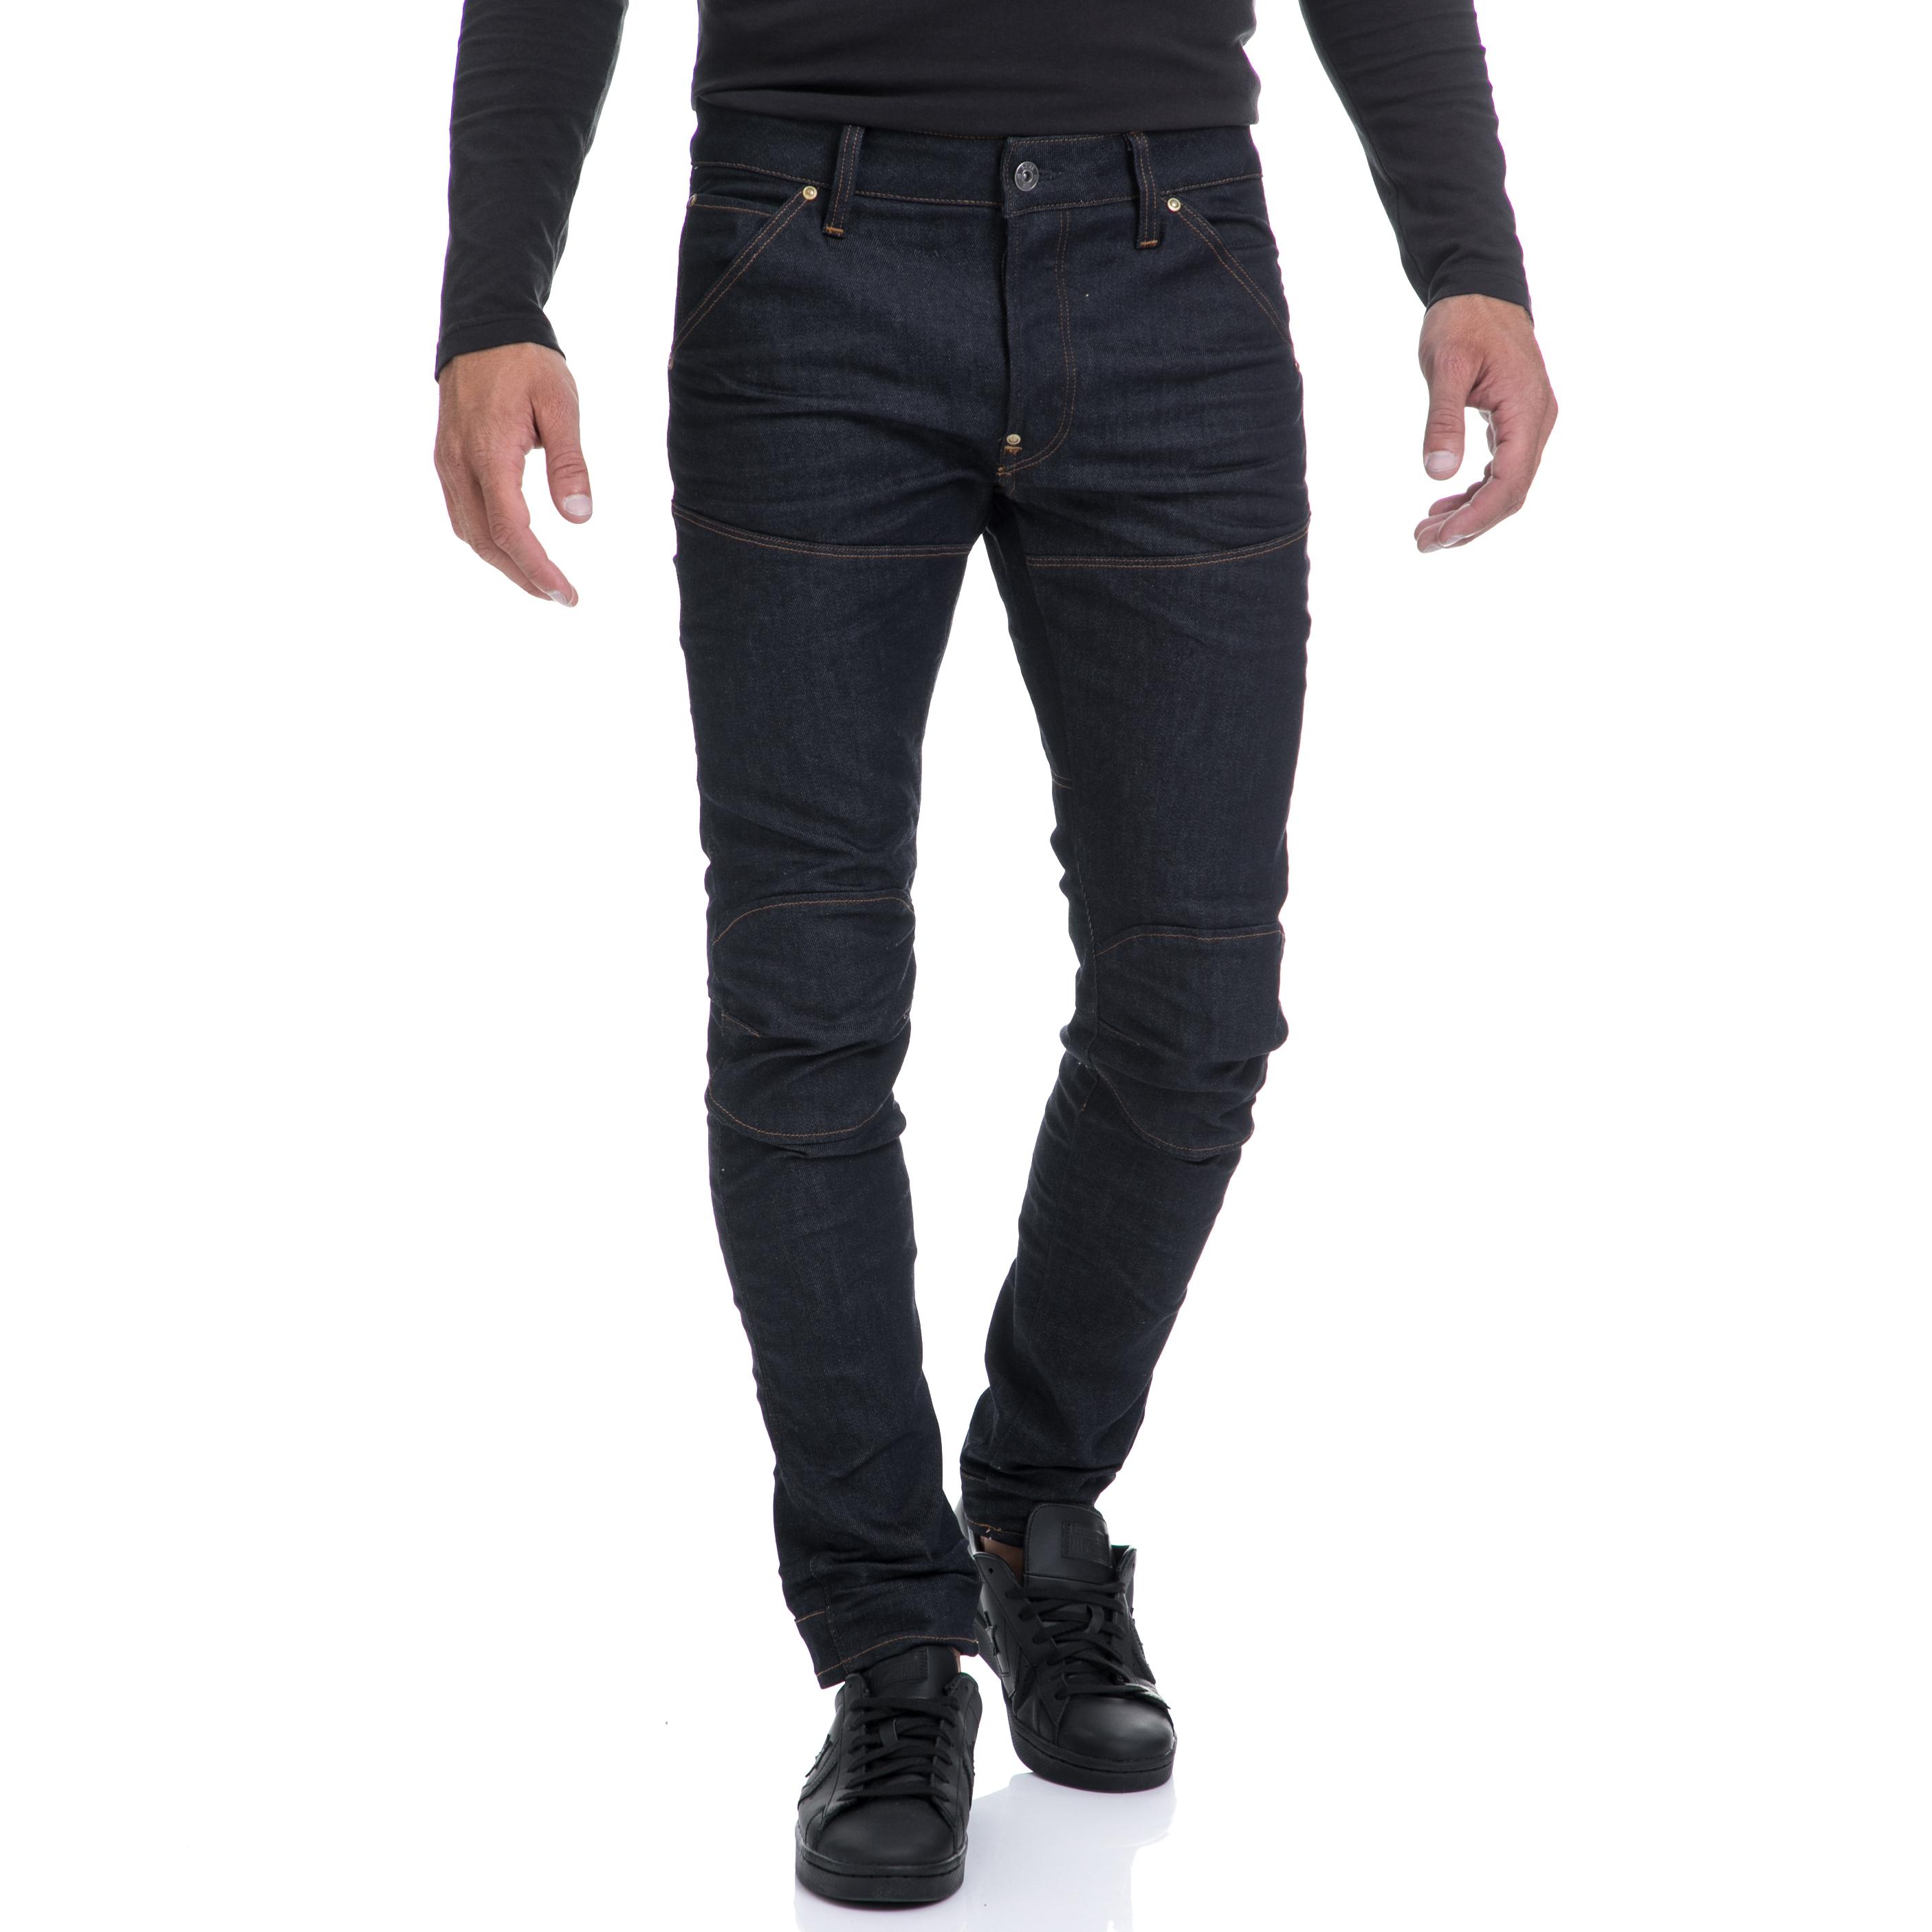 G-STAR RAW – Αντρικό τζιν παντελόνι G-STAR RAW μπλε